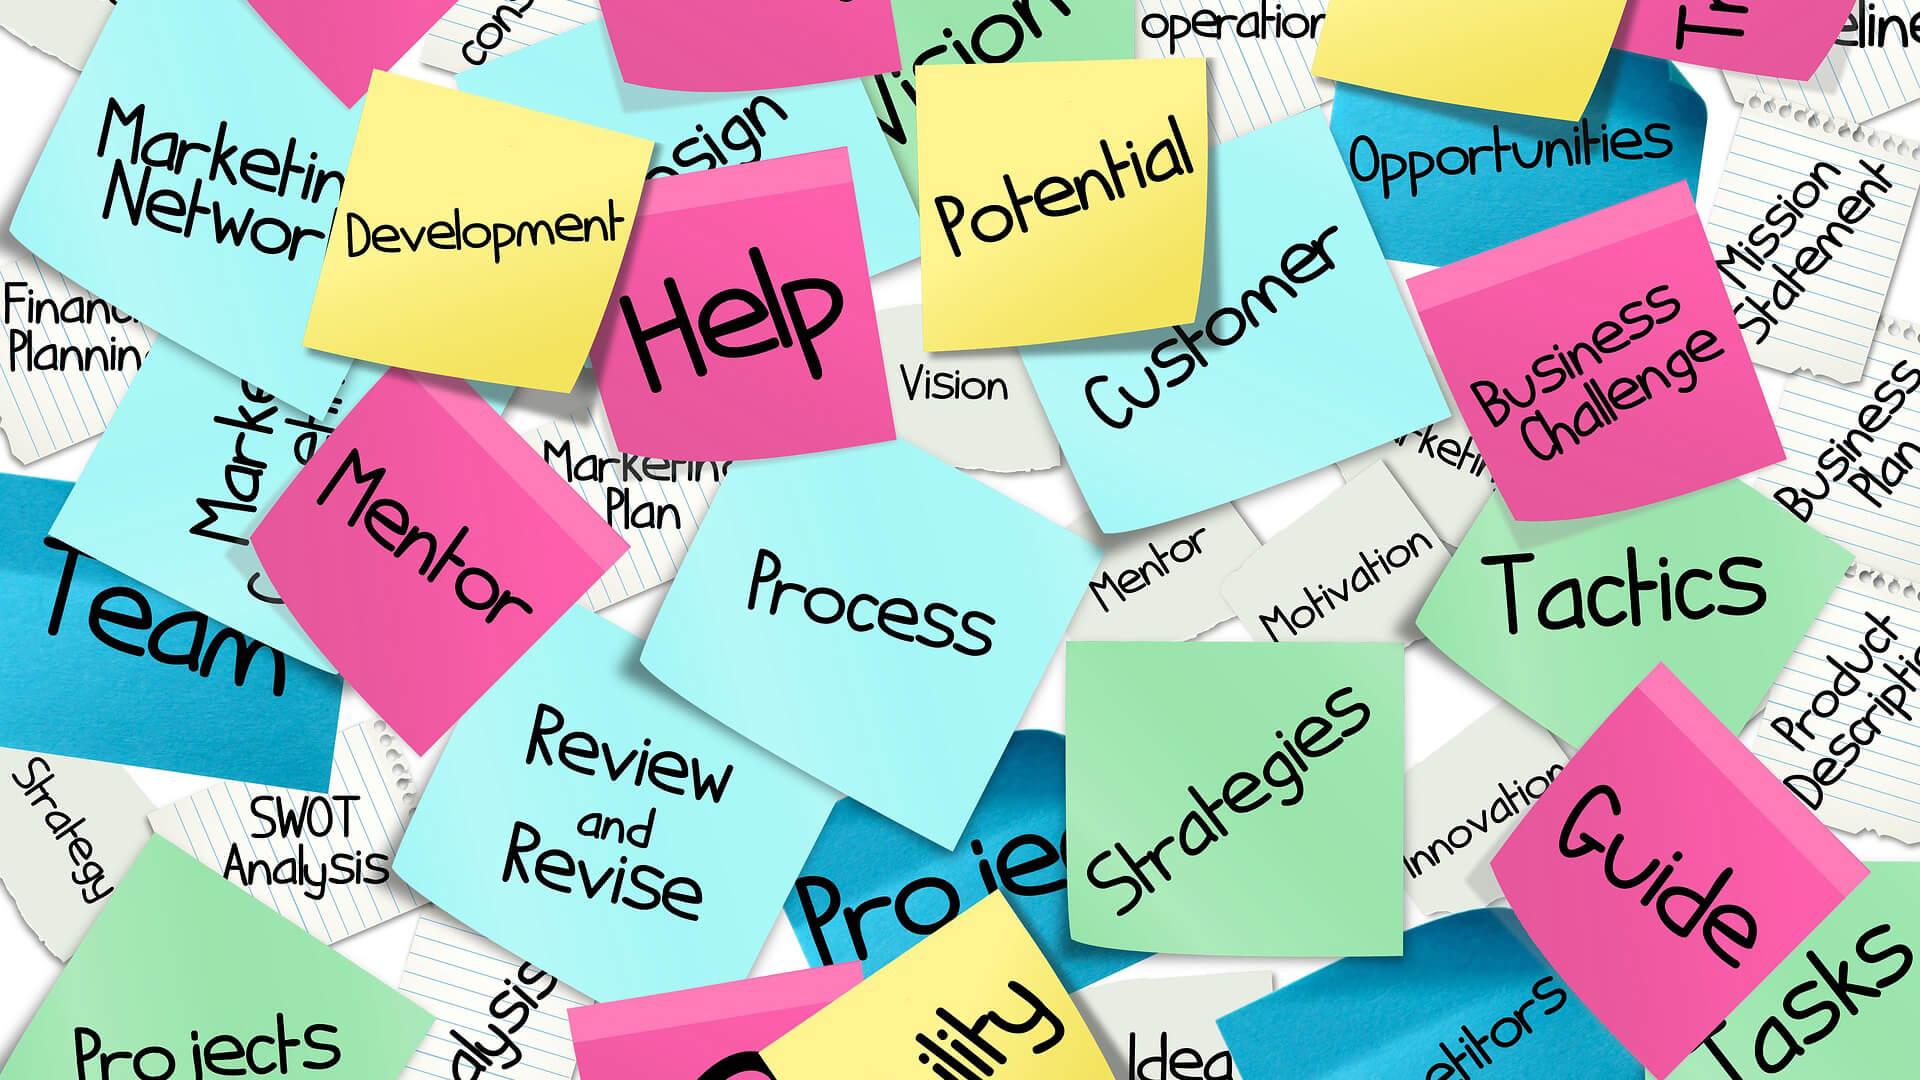 Importance of Employee Development